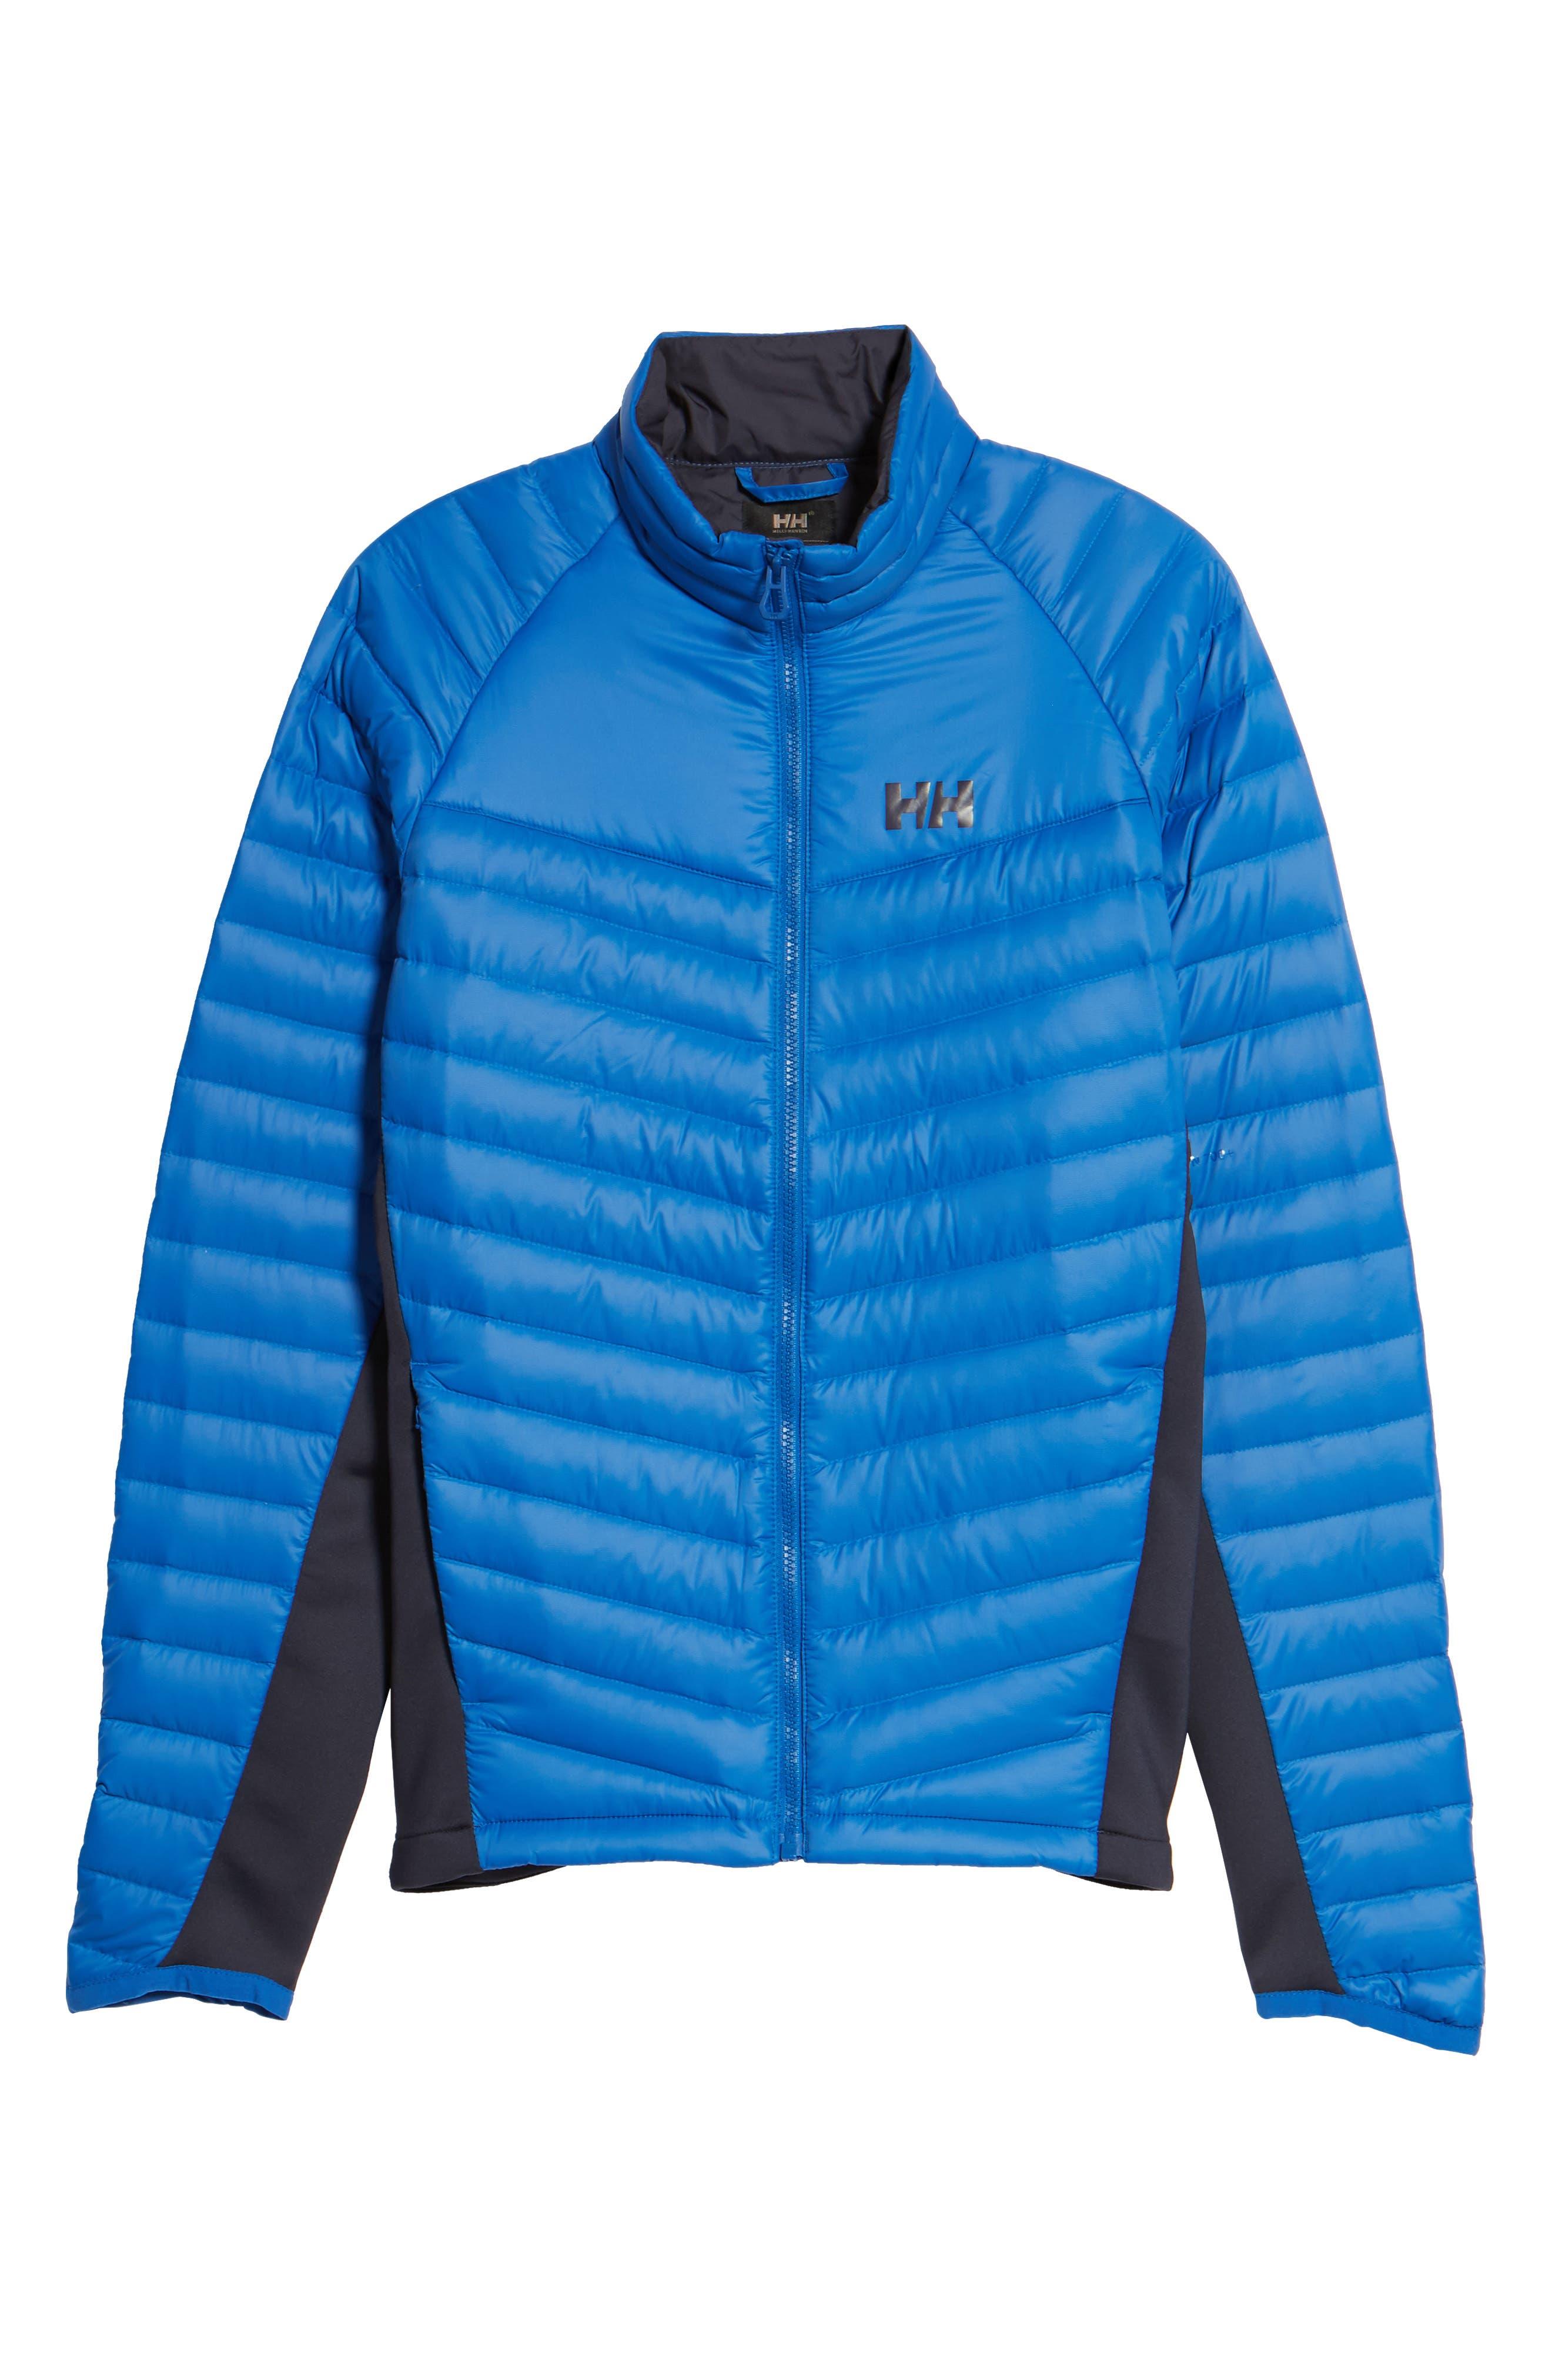 Verglas Insulator Hybrid Jacket,                             Alternate thumbnail 6, color,                             563 Olympian Blue